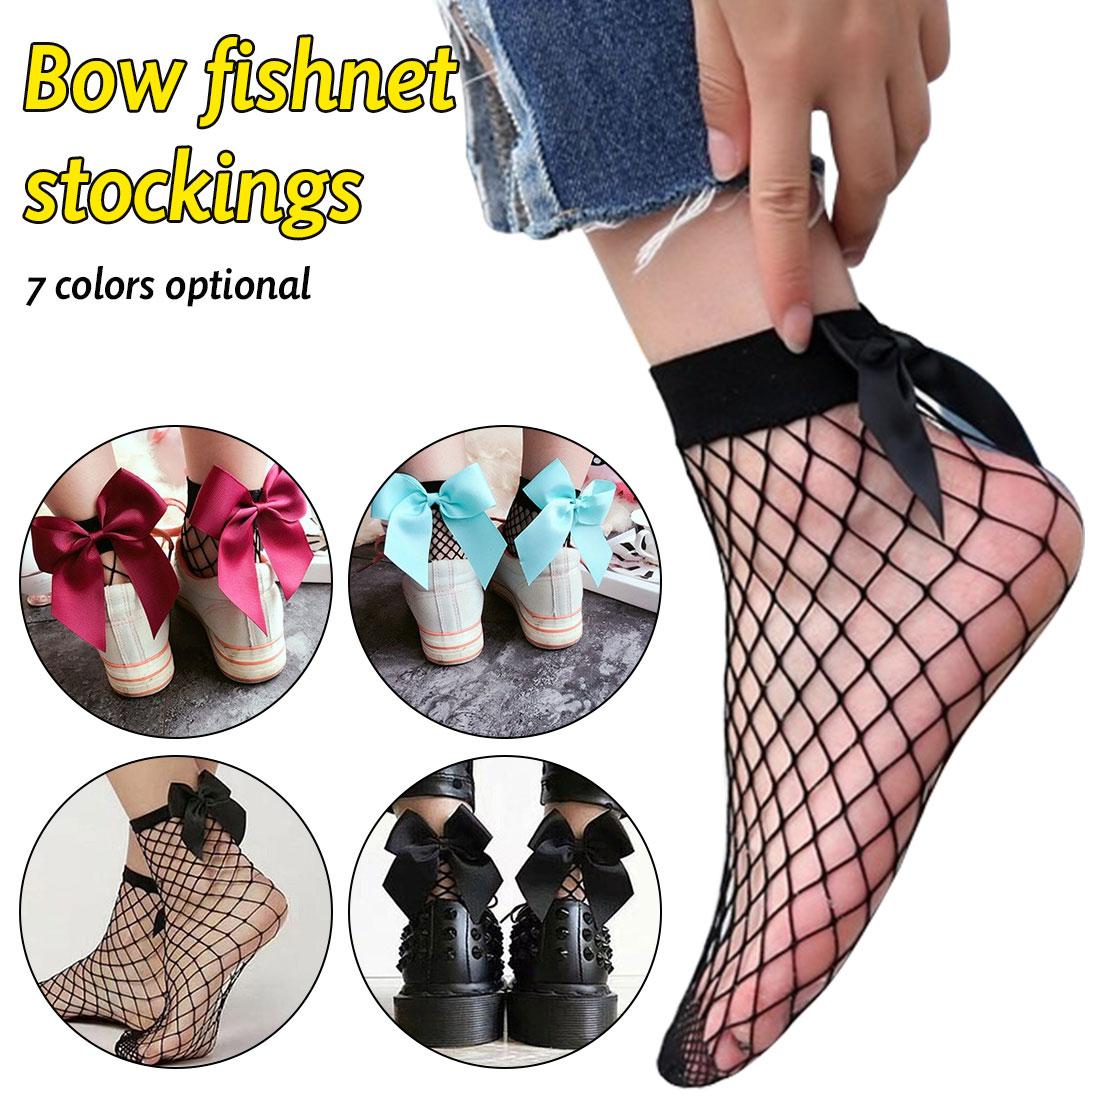 New Casual Women Ruffle Fishnet Ankle High Mesh Lace Fish Net Short Thin design Harajuku Hollow out Mesh Nets Socks in Socks from Underwear Sleepwears